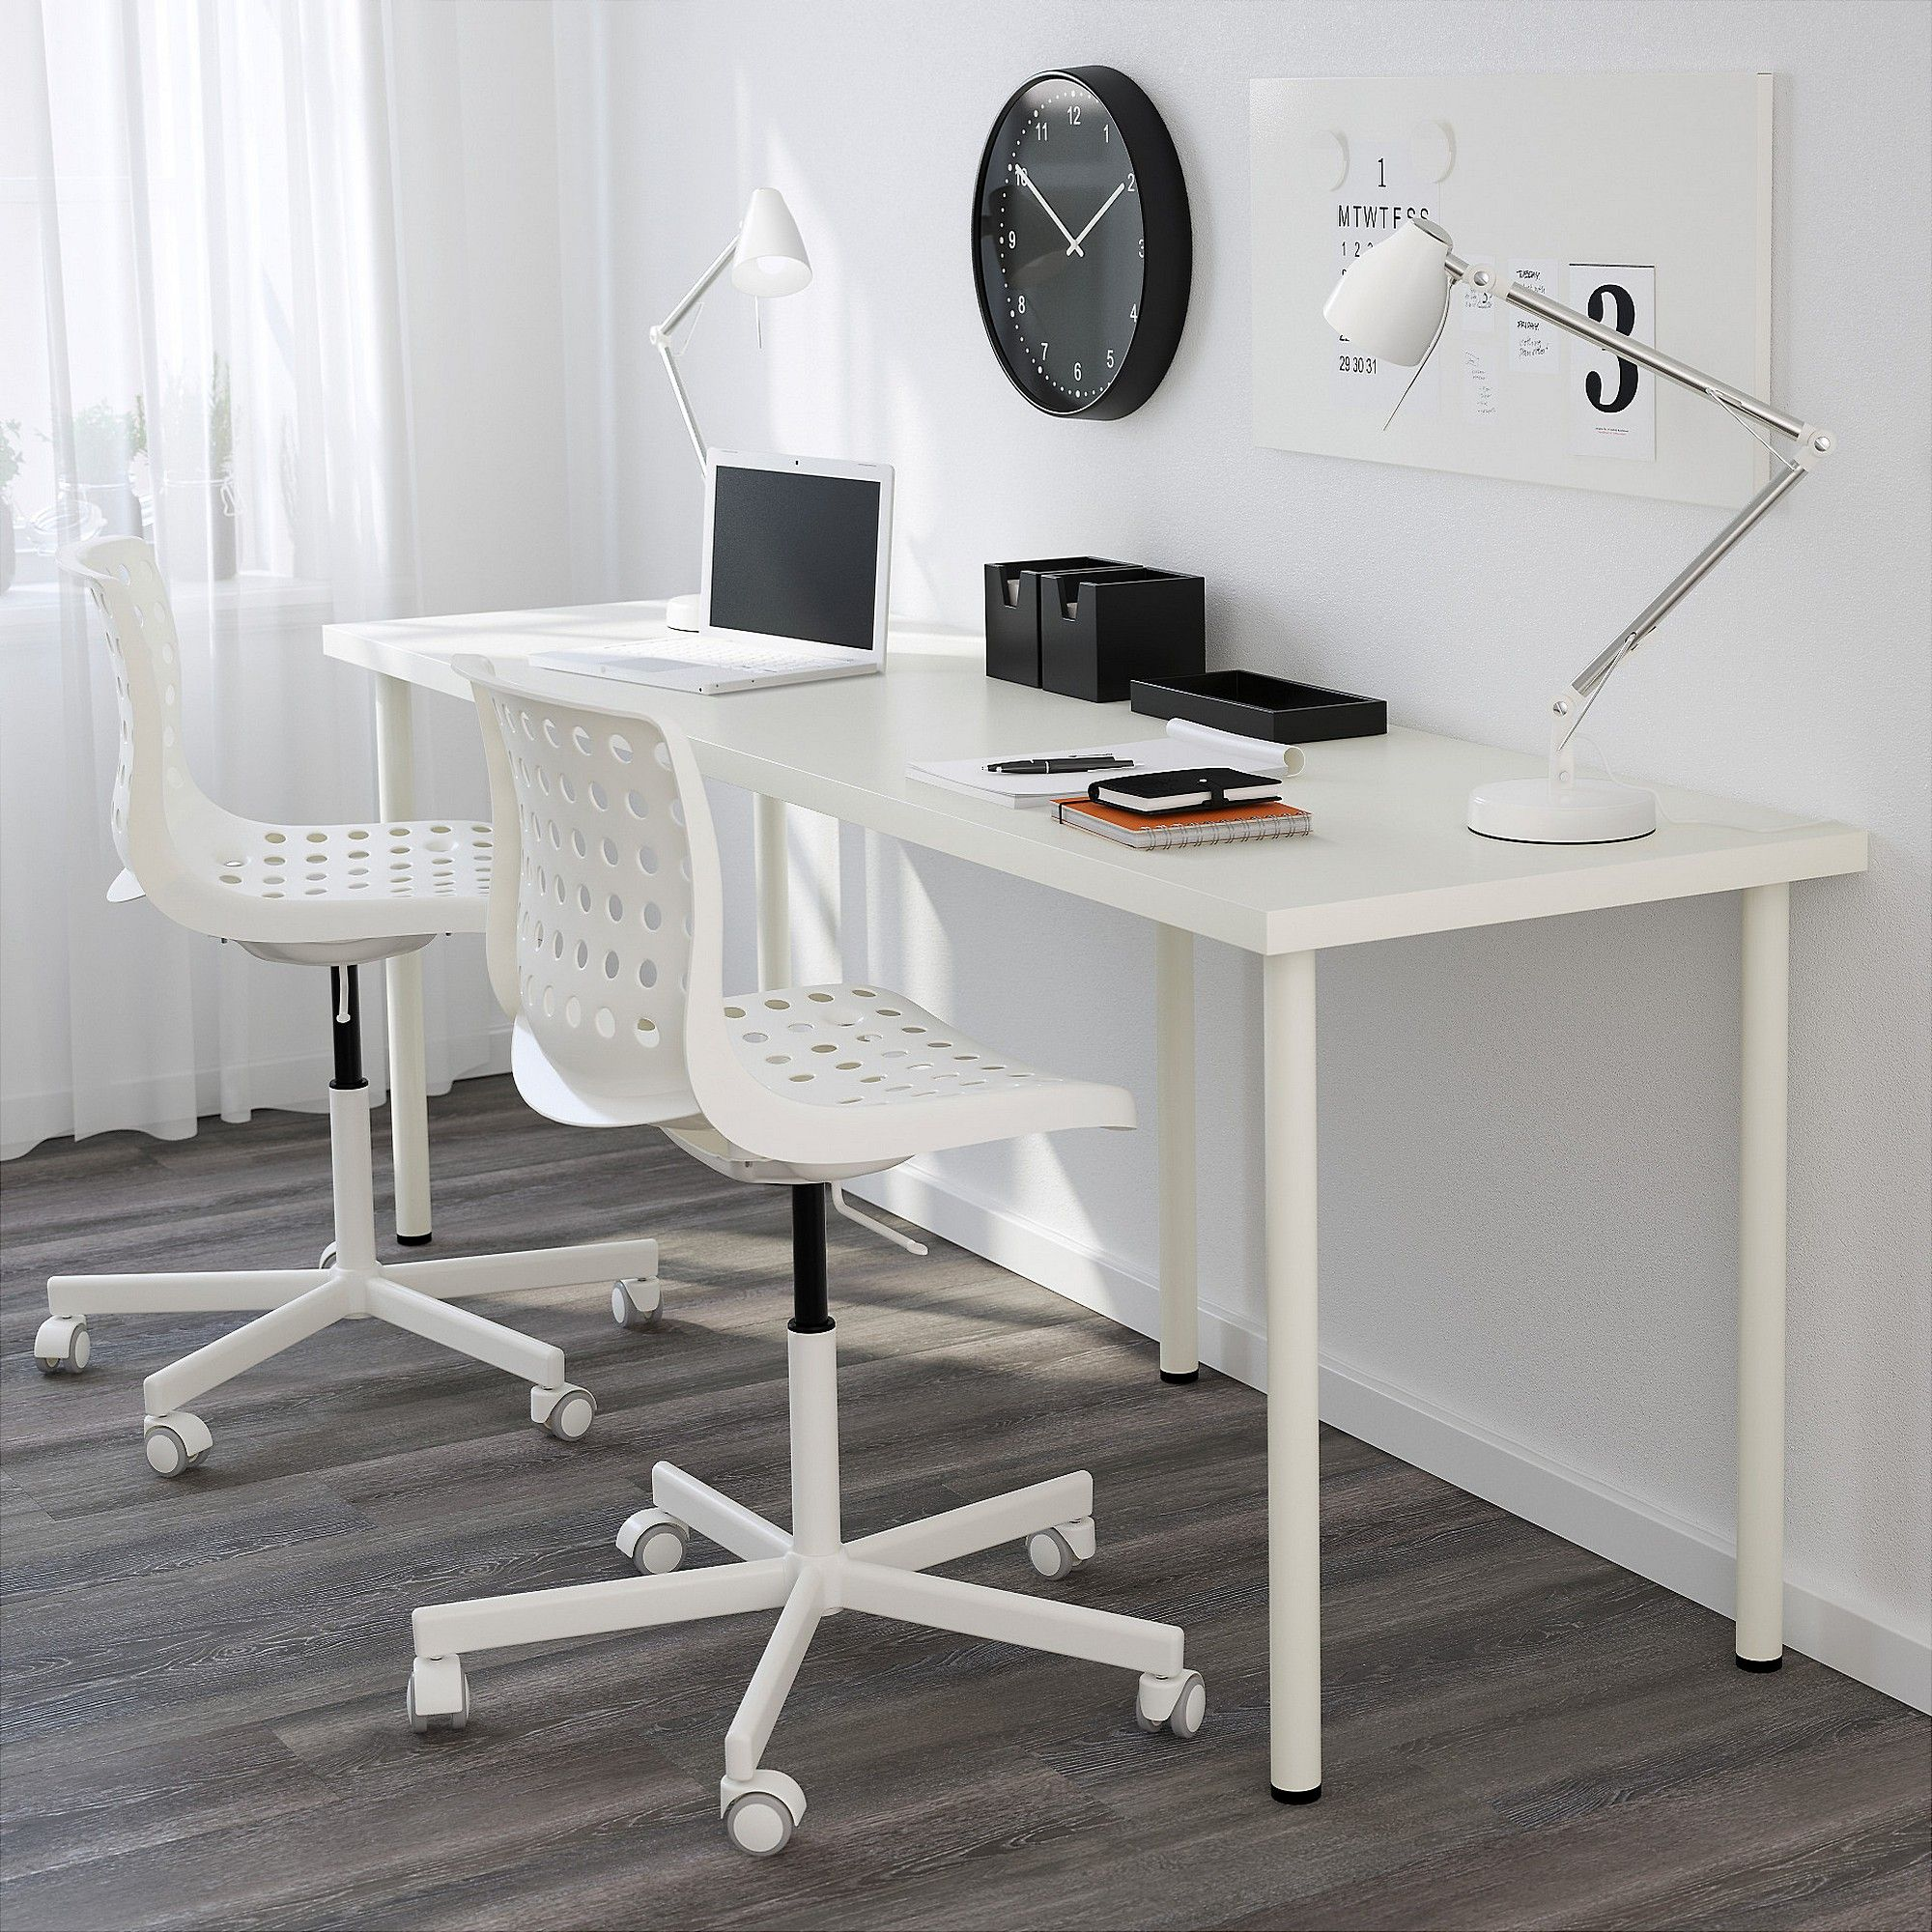 Ikea Linnmon Adils Desk Setup Ikea Table Tops Linnmon Table Top